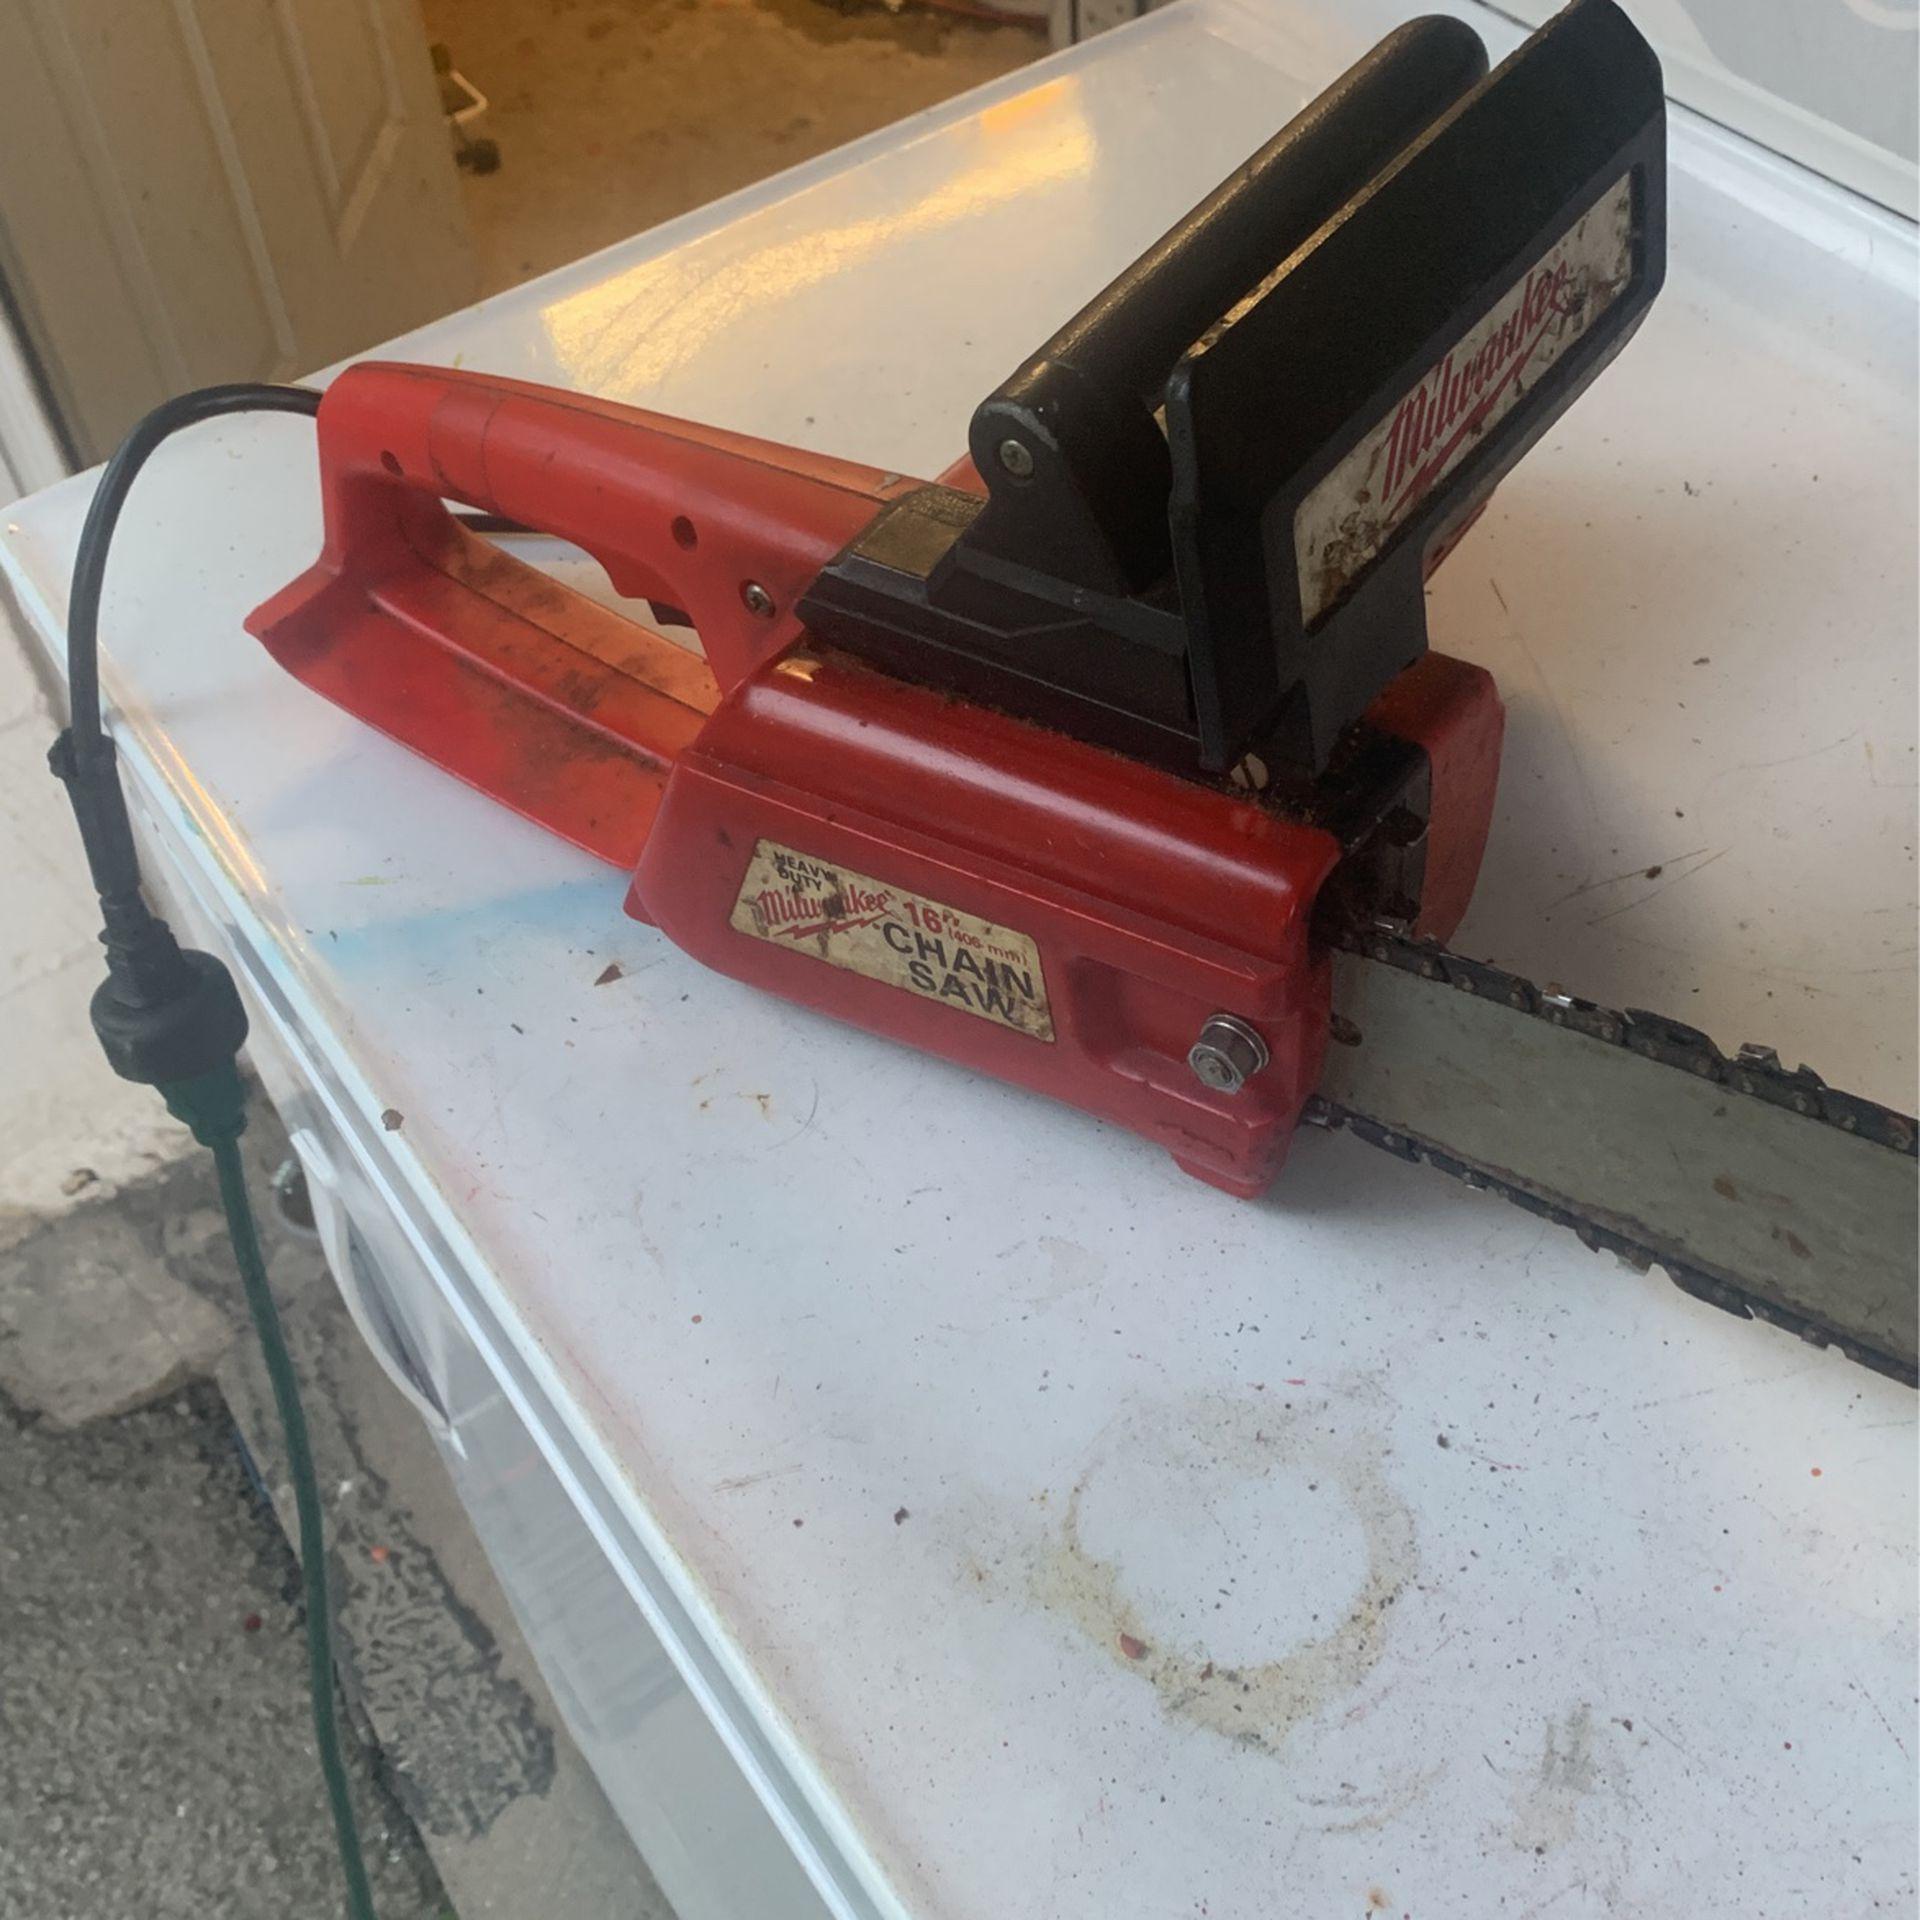 Milwaukee 120 V electric chainsaw